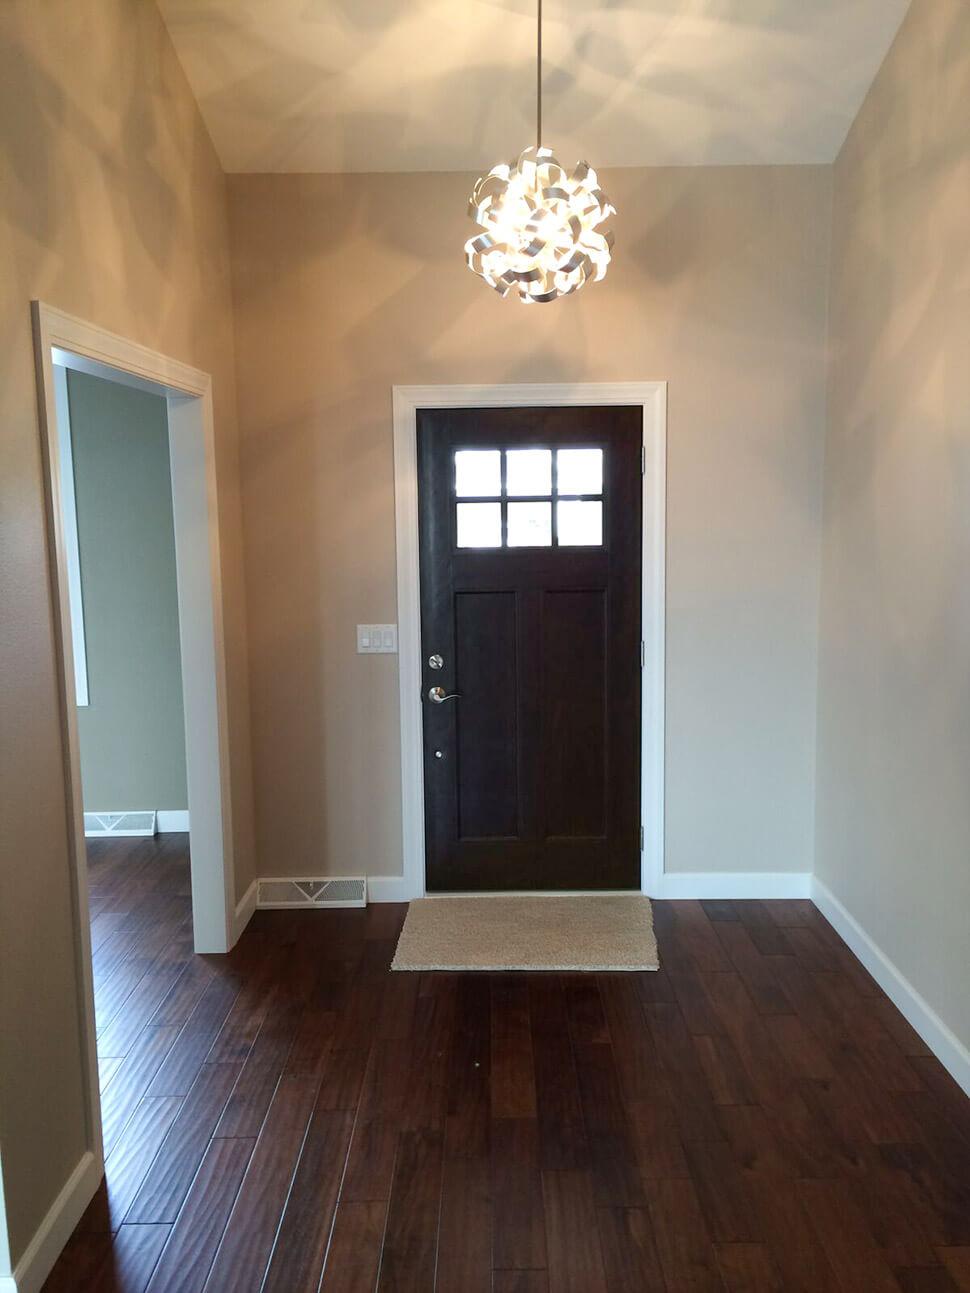 Entry way - the Adams floor plan - 2120sq ft